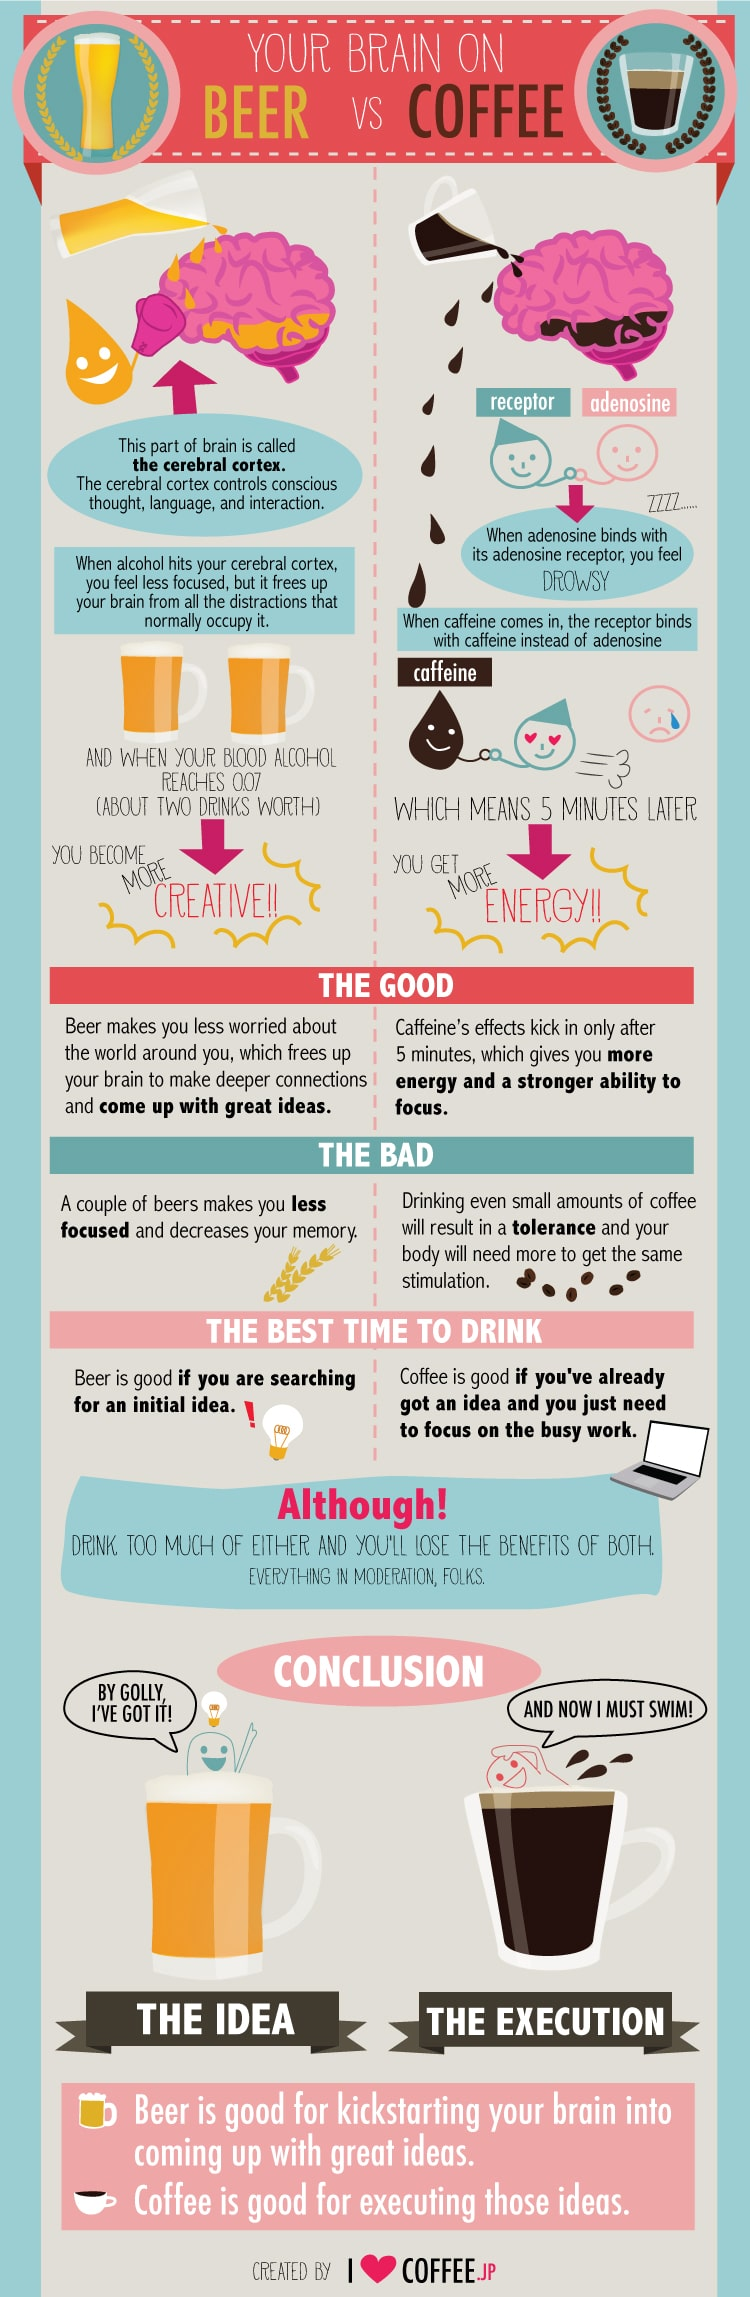 beer-coffee-brain-creativity-infographic